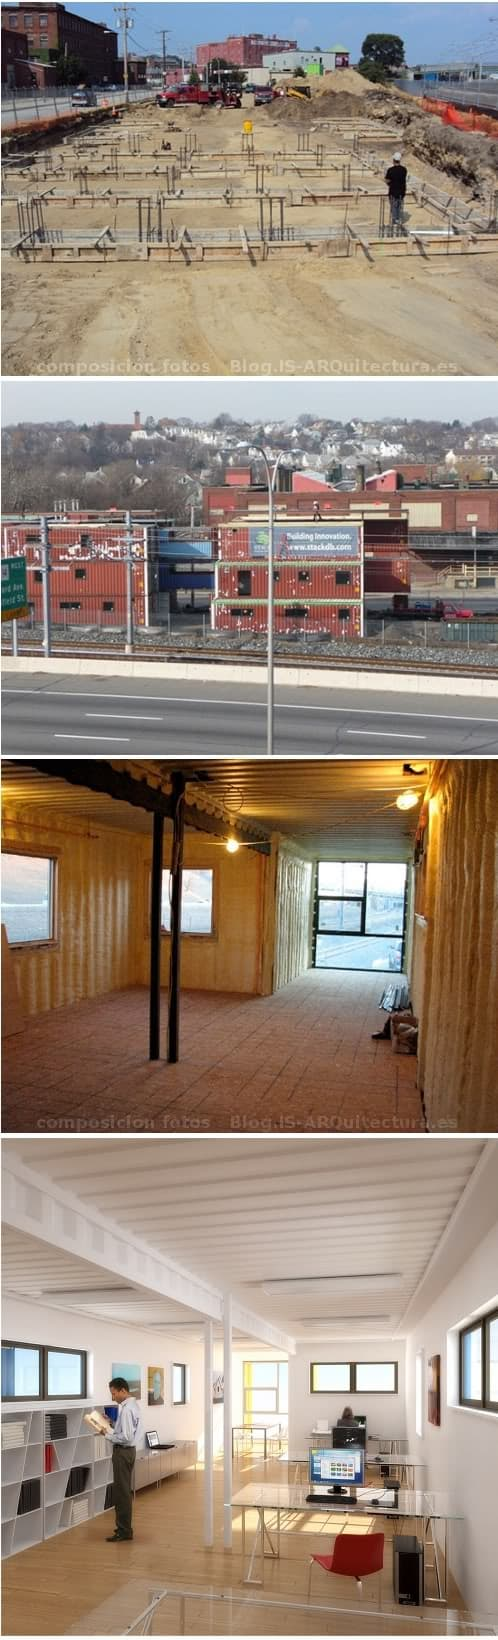 fotos de obra de edificio con contenedores de carga